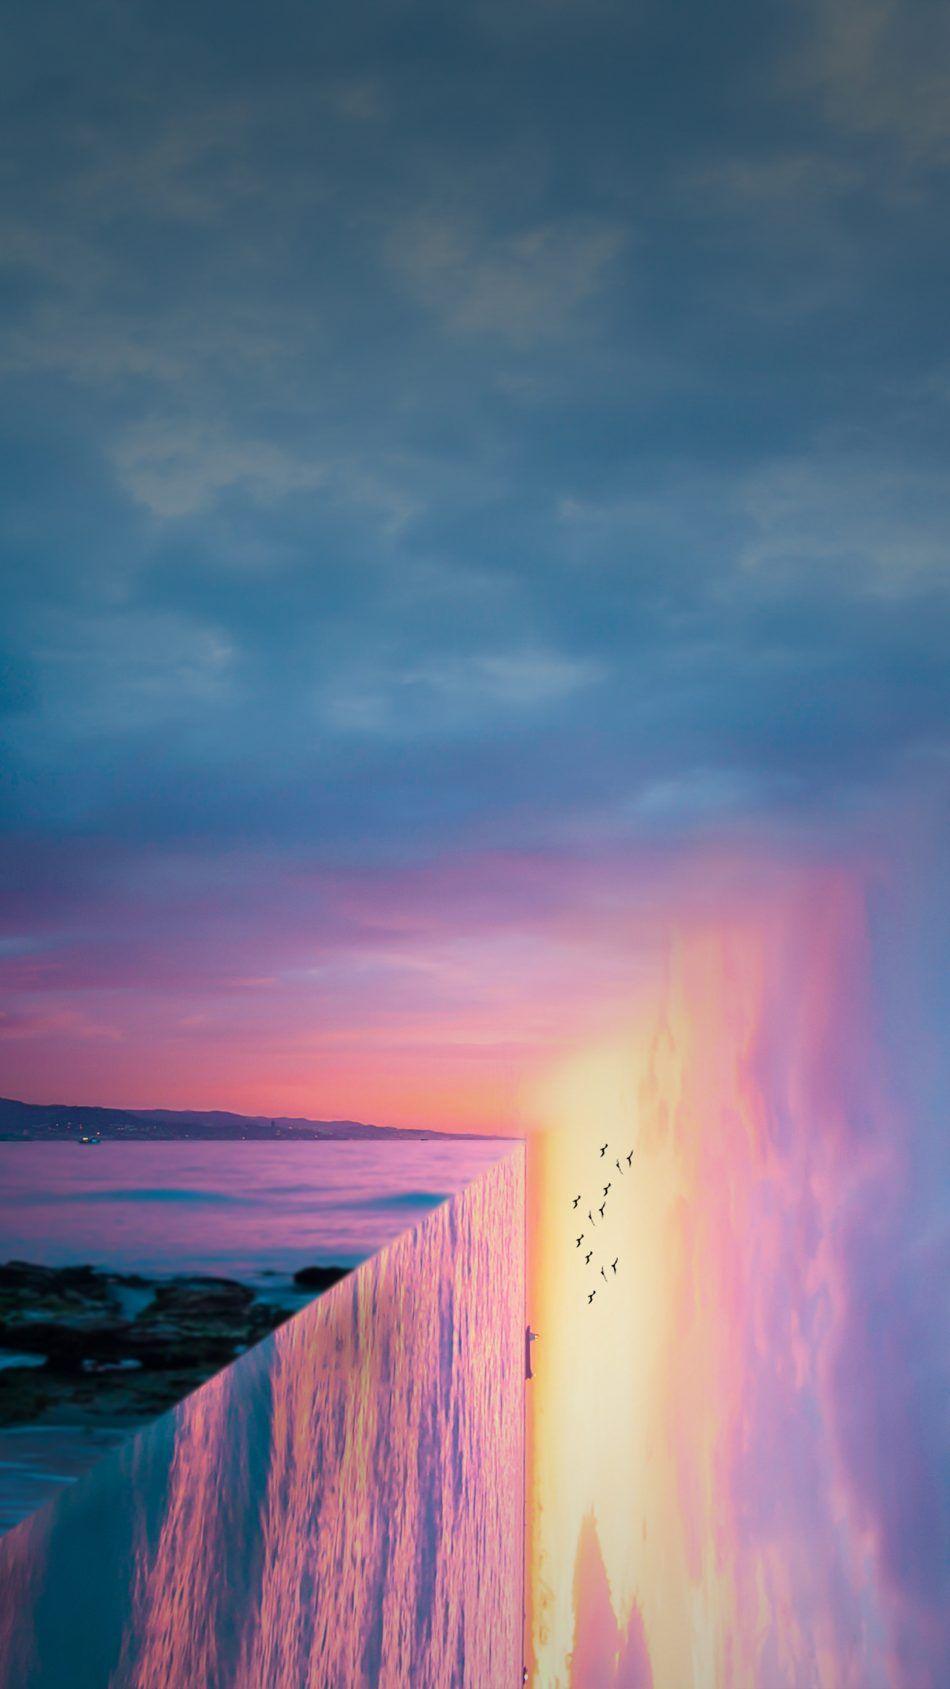 Sunset Sea Reflection Art 4k Ultra Hd Mobile Wallpaper Reflection Art Sky Aesthetic Sunset Sea